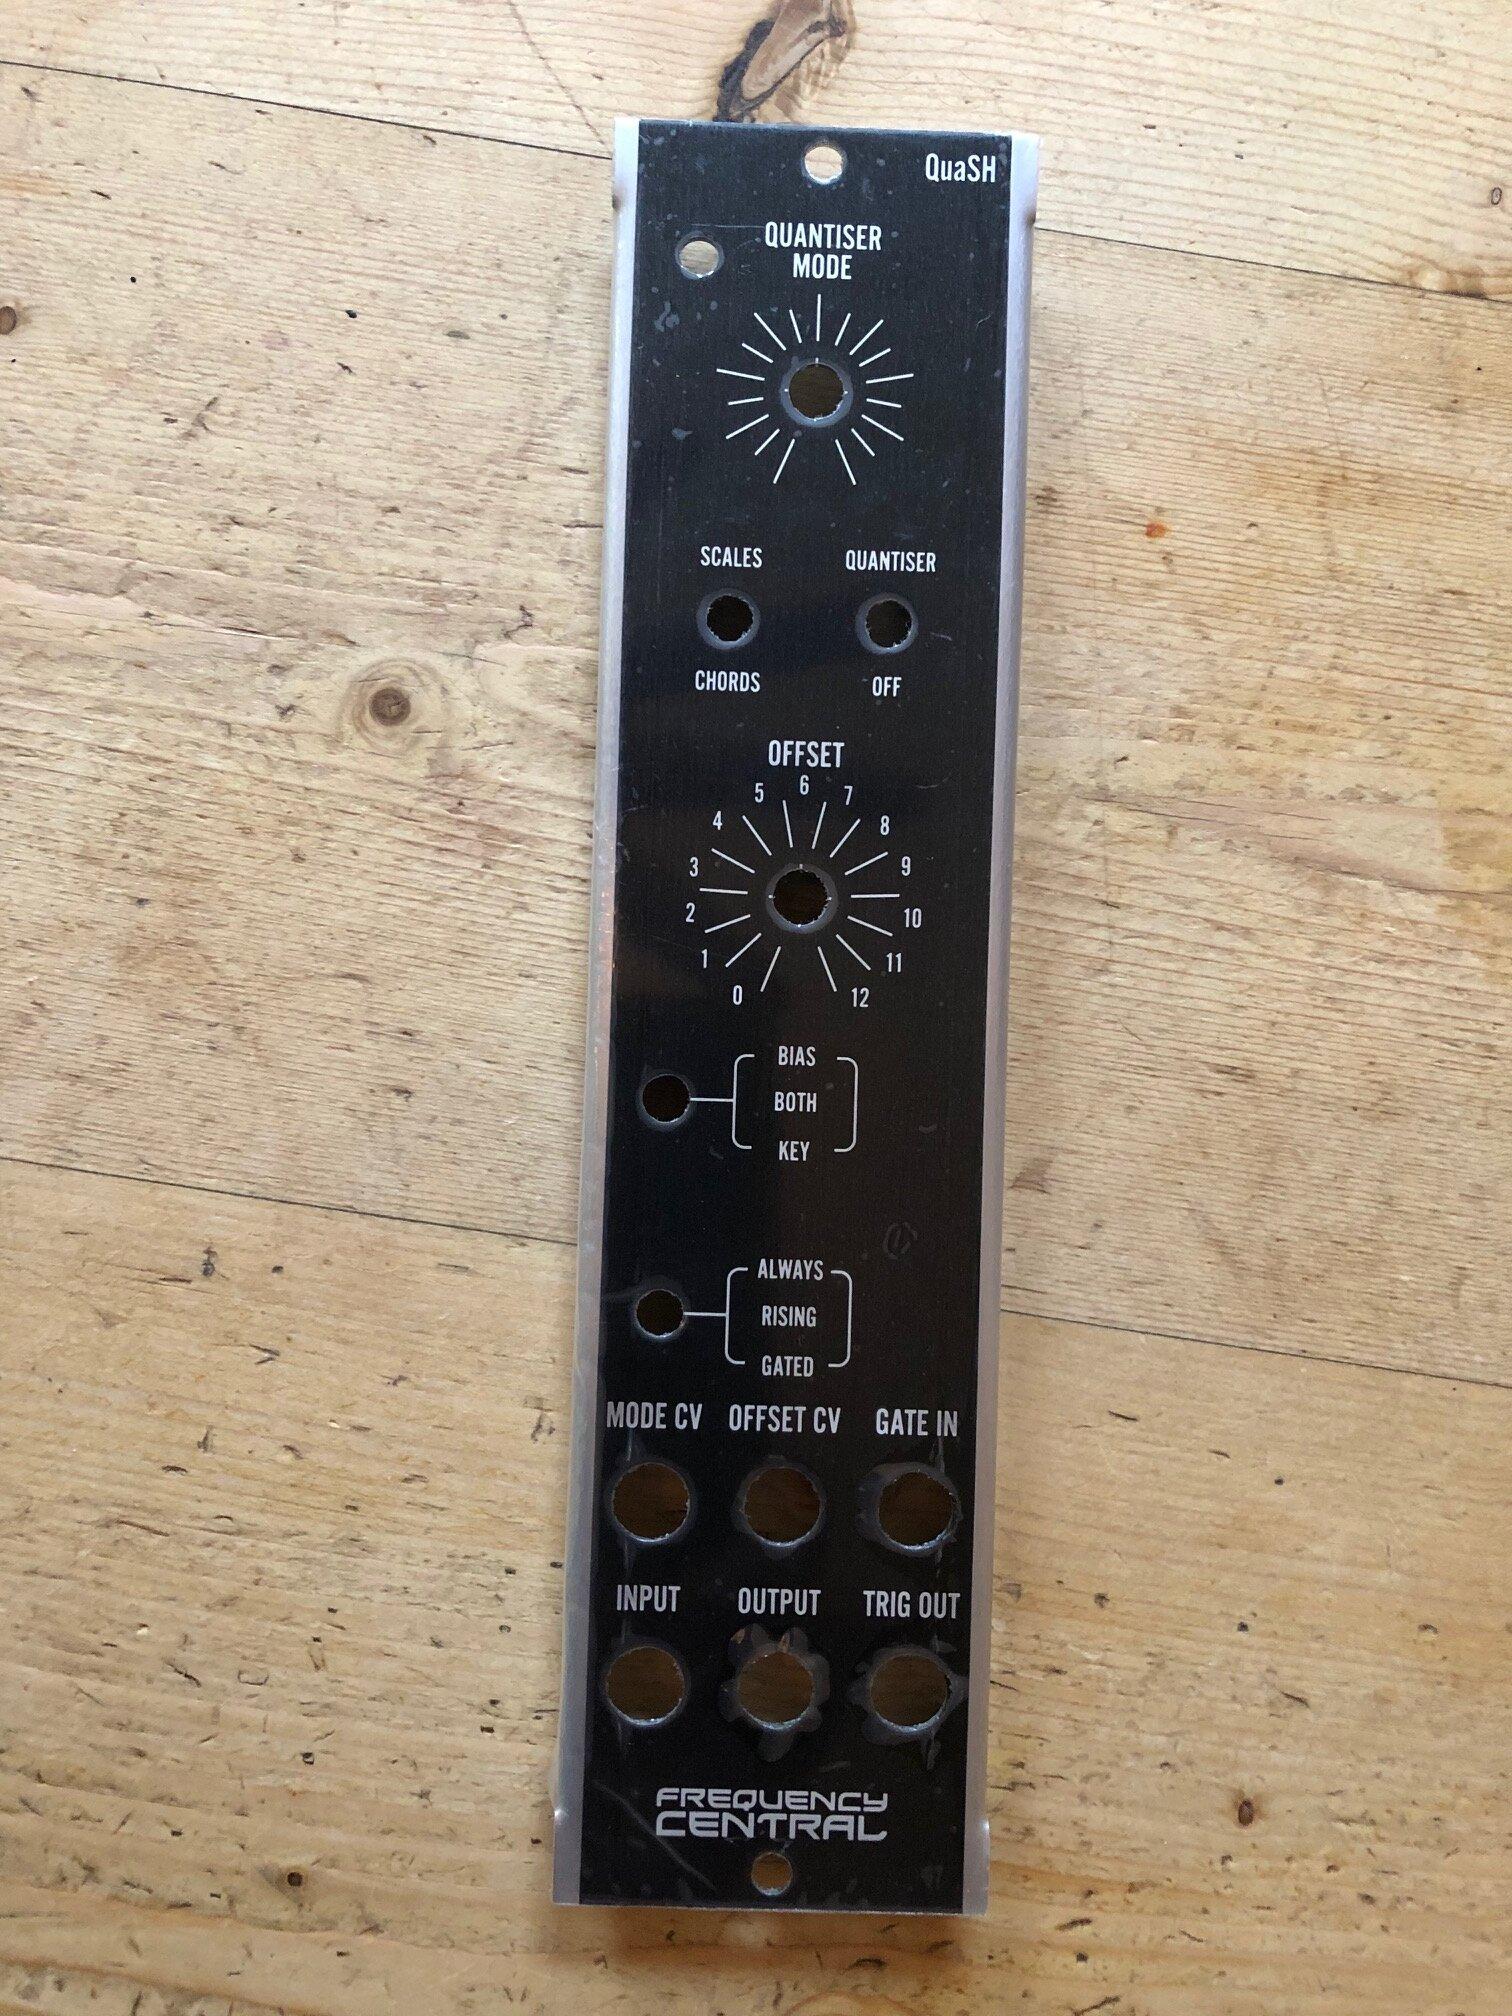 QuaSH MU module panel.